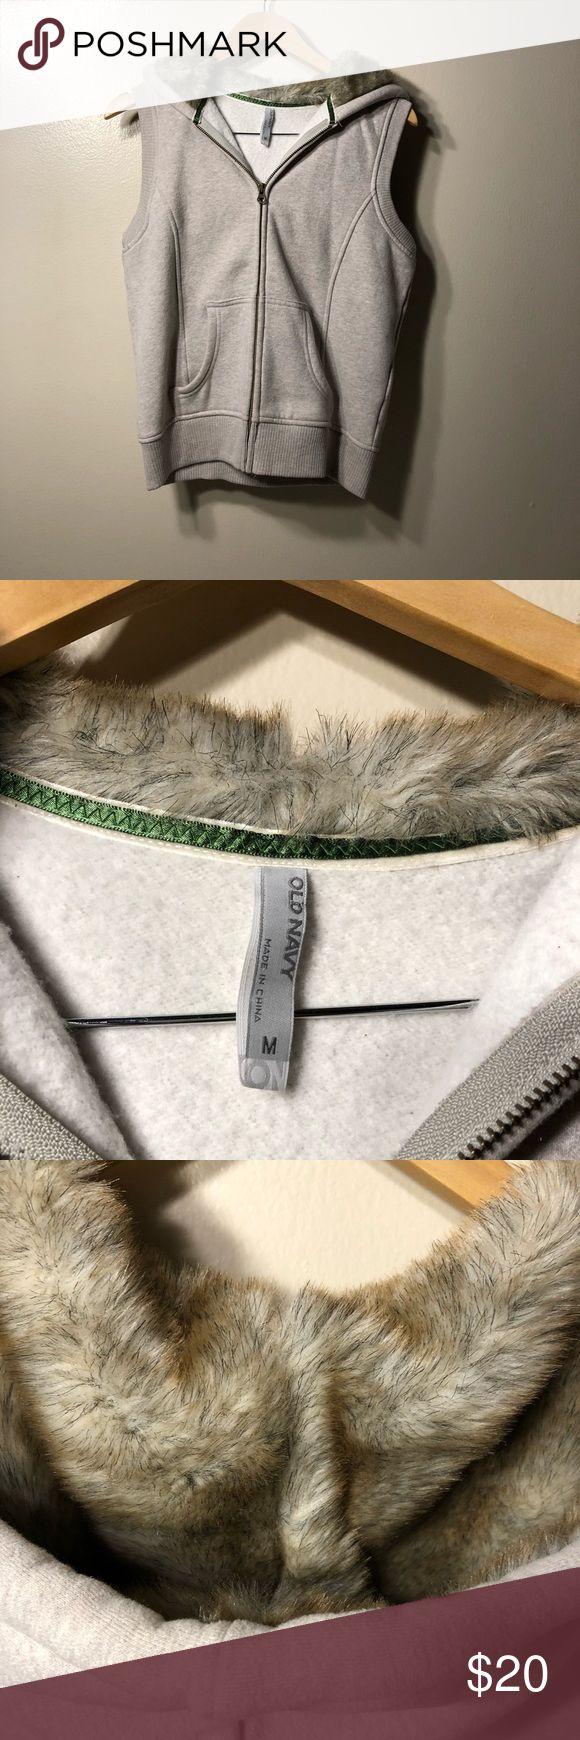 "Old Navy  Fleece Vest with Fur Lined Hood Old Navy Fleece Vest with Fur Lined Hood Size Medium. Length 20.5"" armpit to armpit 20"" light gray Old Navy Jackets & Coats Vests"